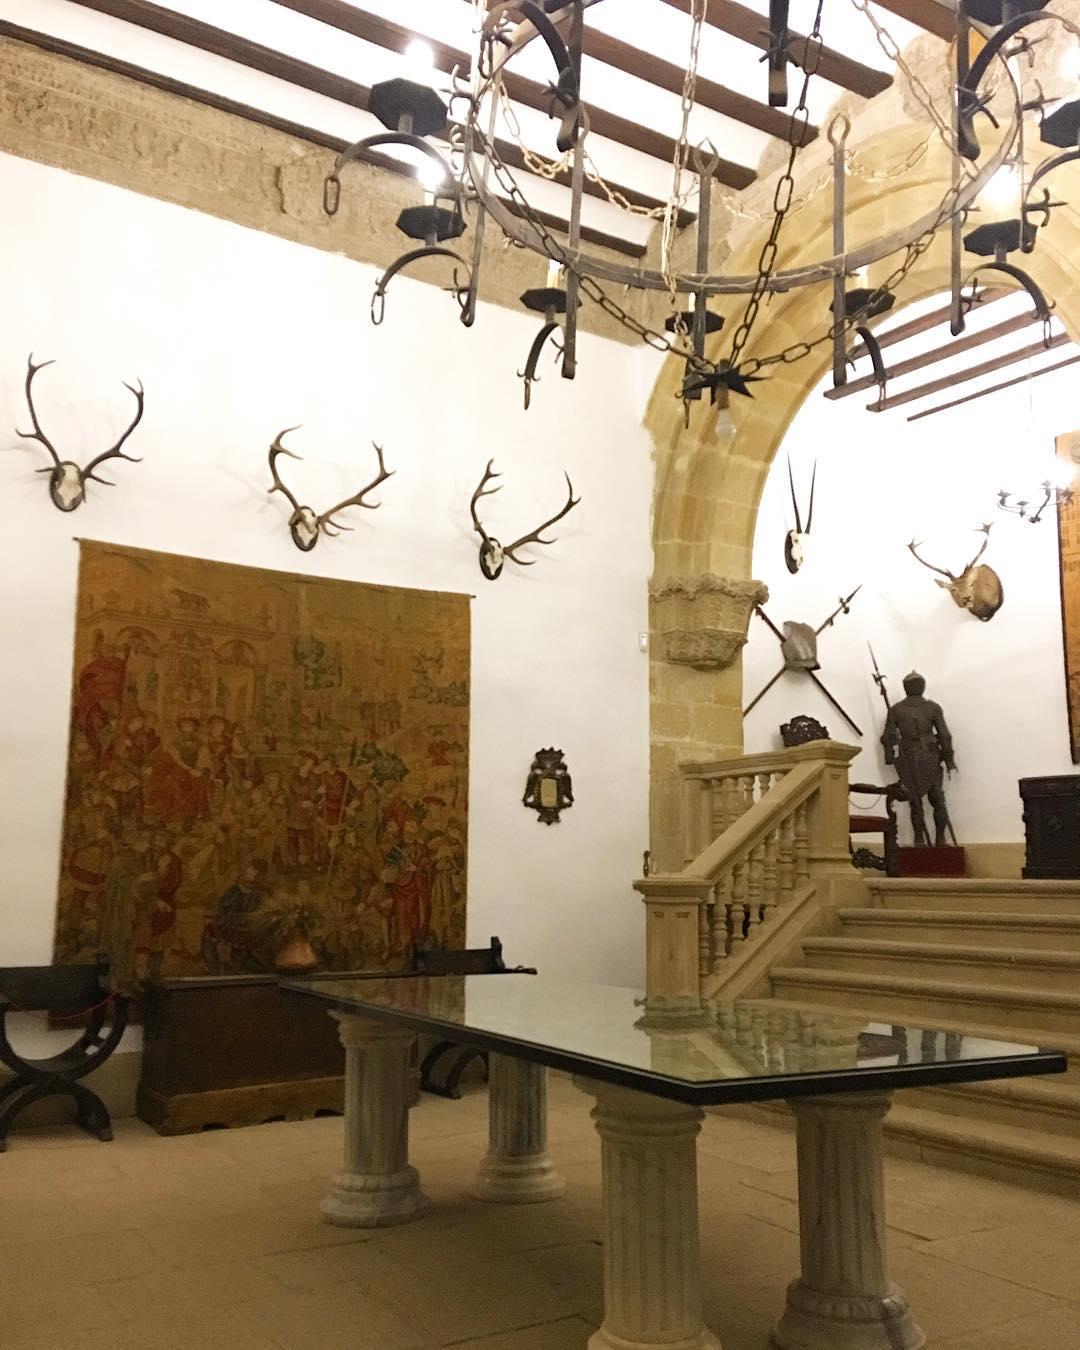 Dîner au château @castillodecanena ... un goût de Game of Thrones, non?! . . ➕ Castillo de Canena • Producteur d'huiles d'olive ?  Canena • Spain ?? . ? 6 jours en ANDALOUSIE . ?? tout suivre sur #PintadeEspagne .  ________________  #andaluciatasteslike #andalousie #spain #espagne #andalucia #tourismo #gastronomie #food #blogfood #foodblogger #tourisme #travel #travelblog #blogtravel #trip #citytrip #pintademontpellier #blogvoyage #travelgram #travellover #cityguide #visitspain #almeria #jaen #granada #malaga #castillodecanena #gameofthrones #got